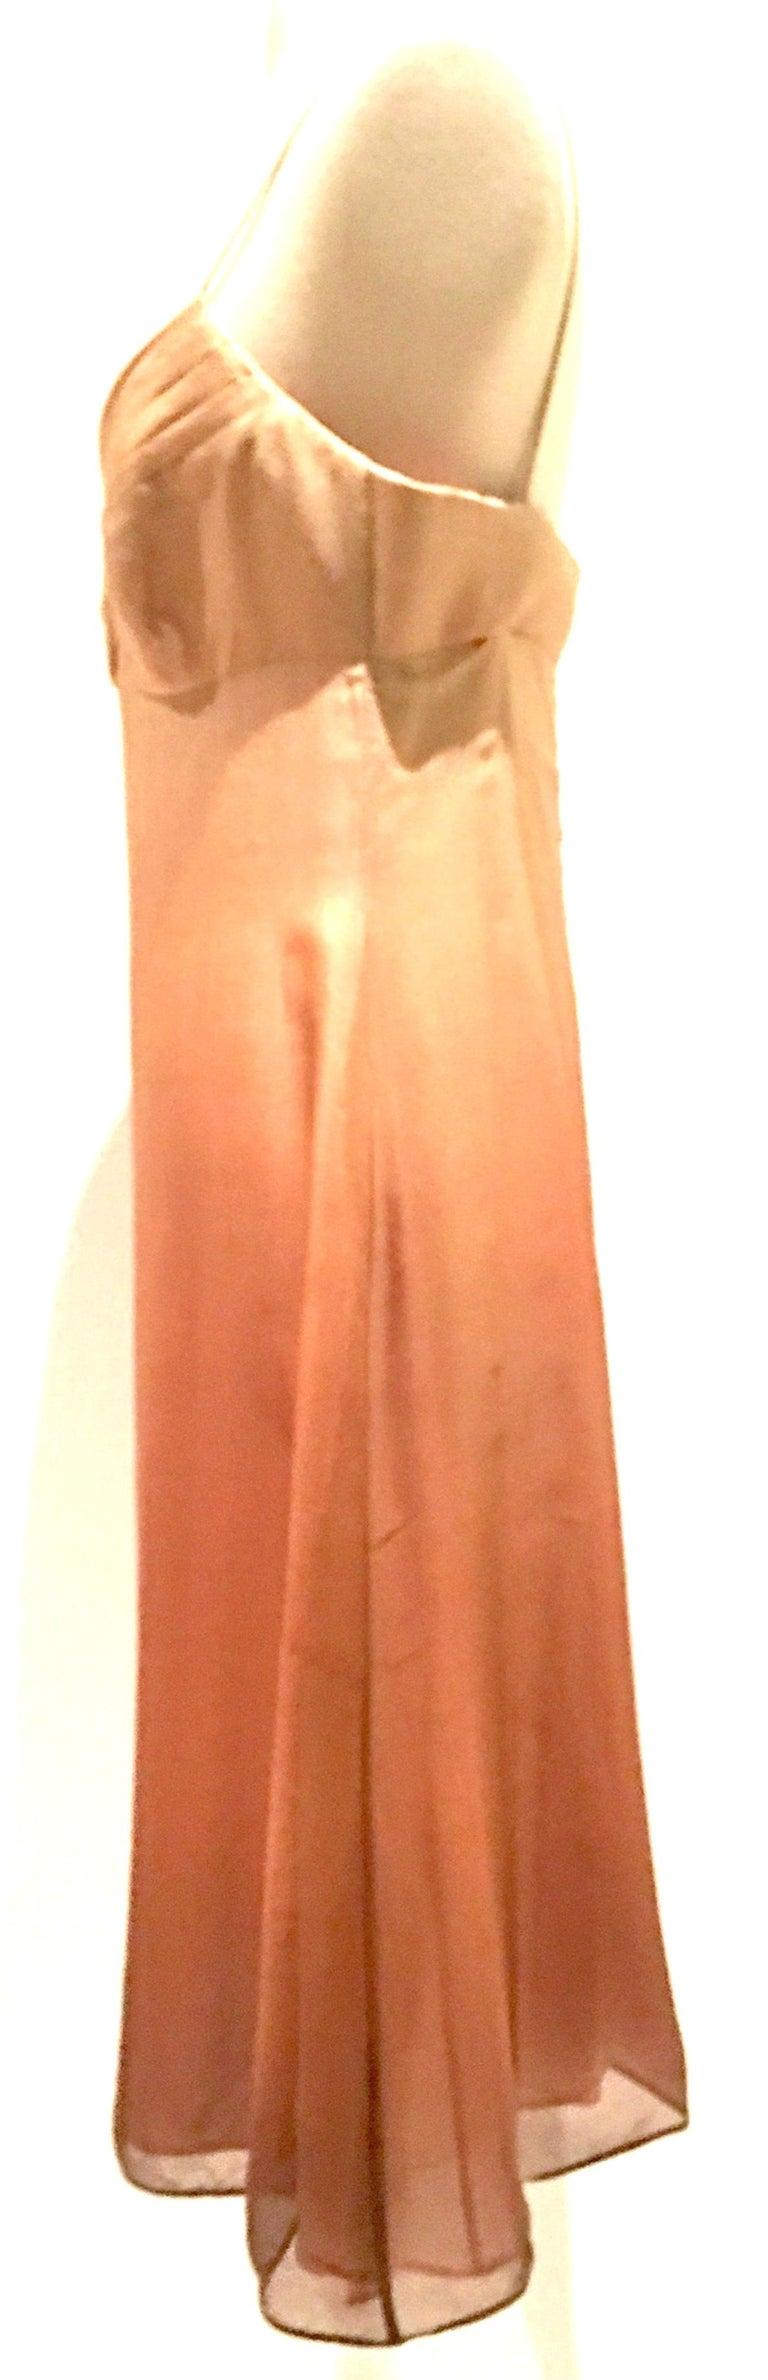 21st Century Italian Silk Chiffon Slip Dress By Girogio Armani - Size 42 In Good Condition For Sale In West Palm Beach, FL